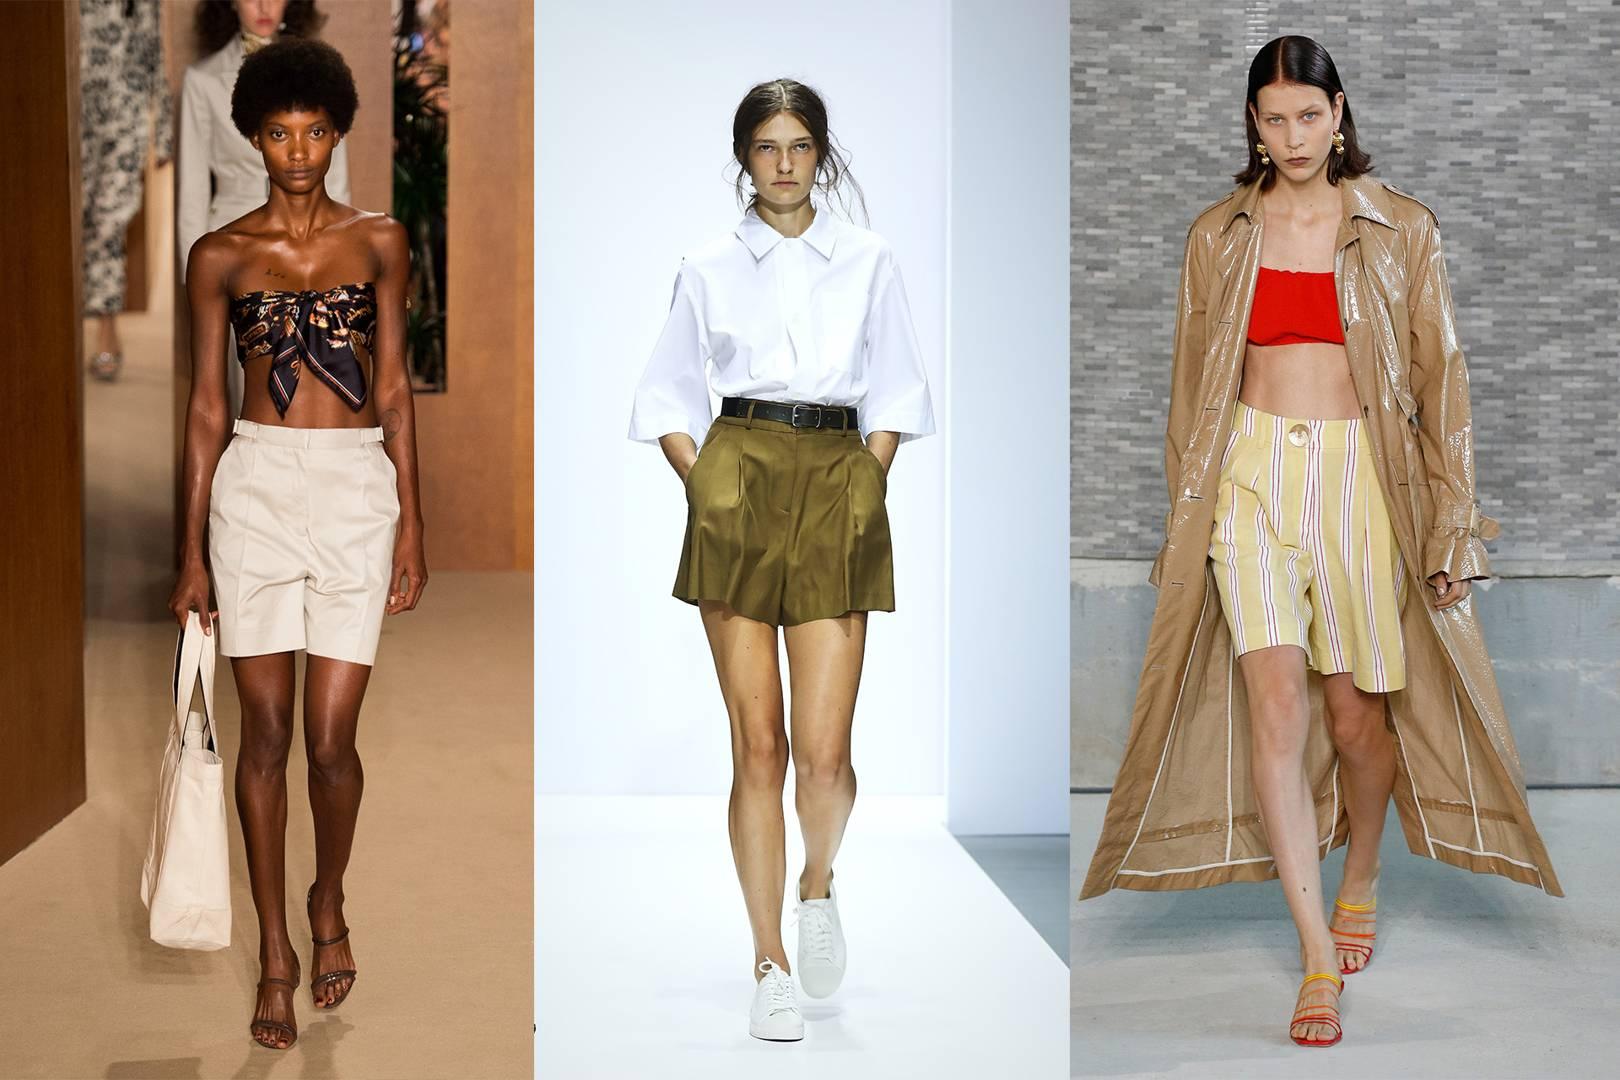 Rational-Shorts 20 Most Stylish Female Celebrities Fashion Trends 2020